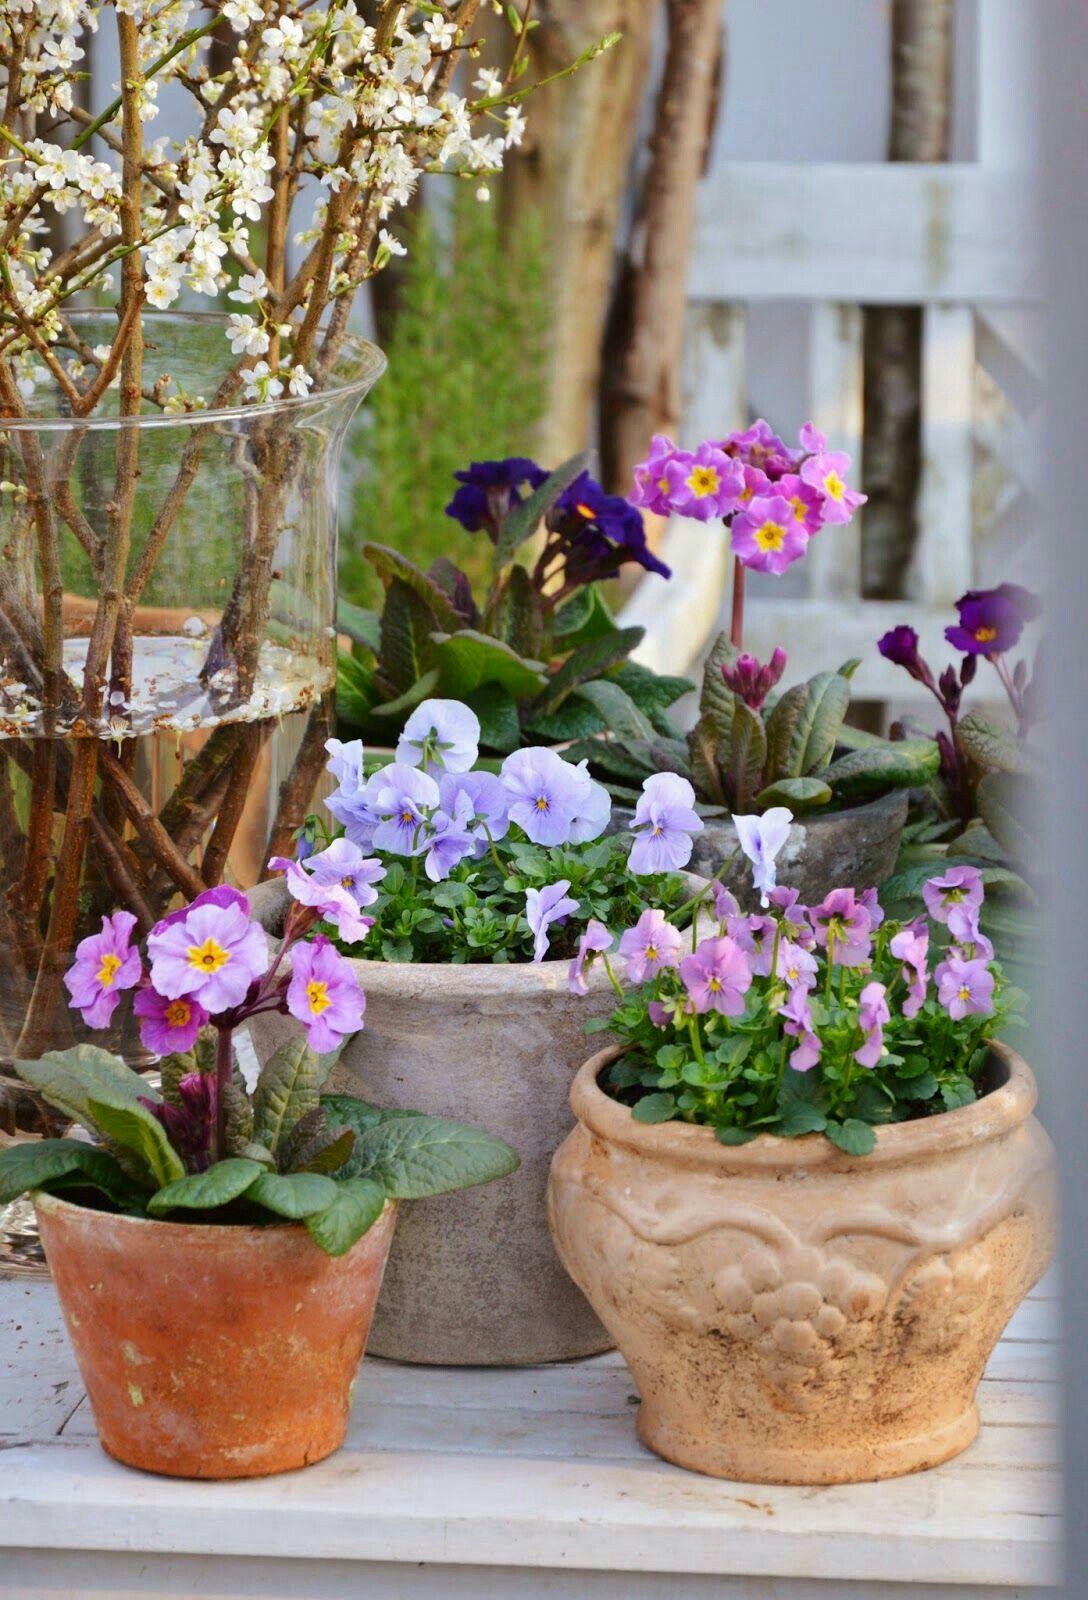 Pin by lisa mansfield on gardening pinterest rabbit and gardens gardens potted gardenpurple flowersspring mightylinksfo